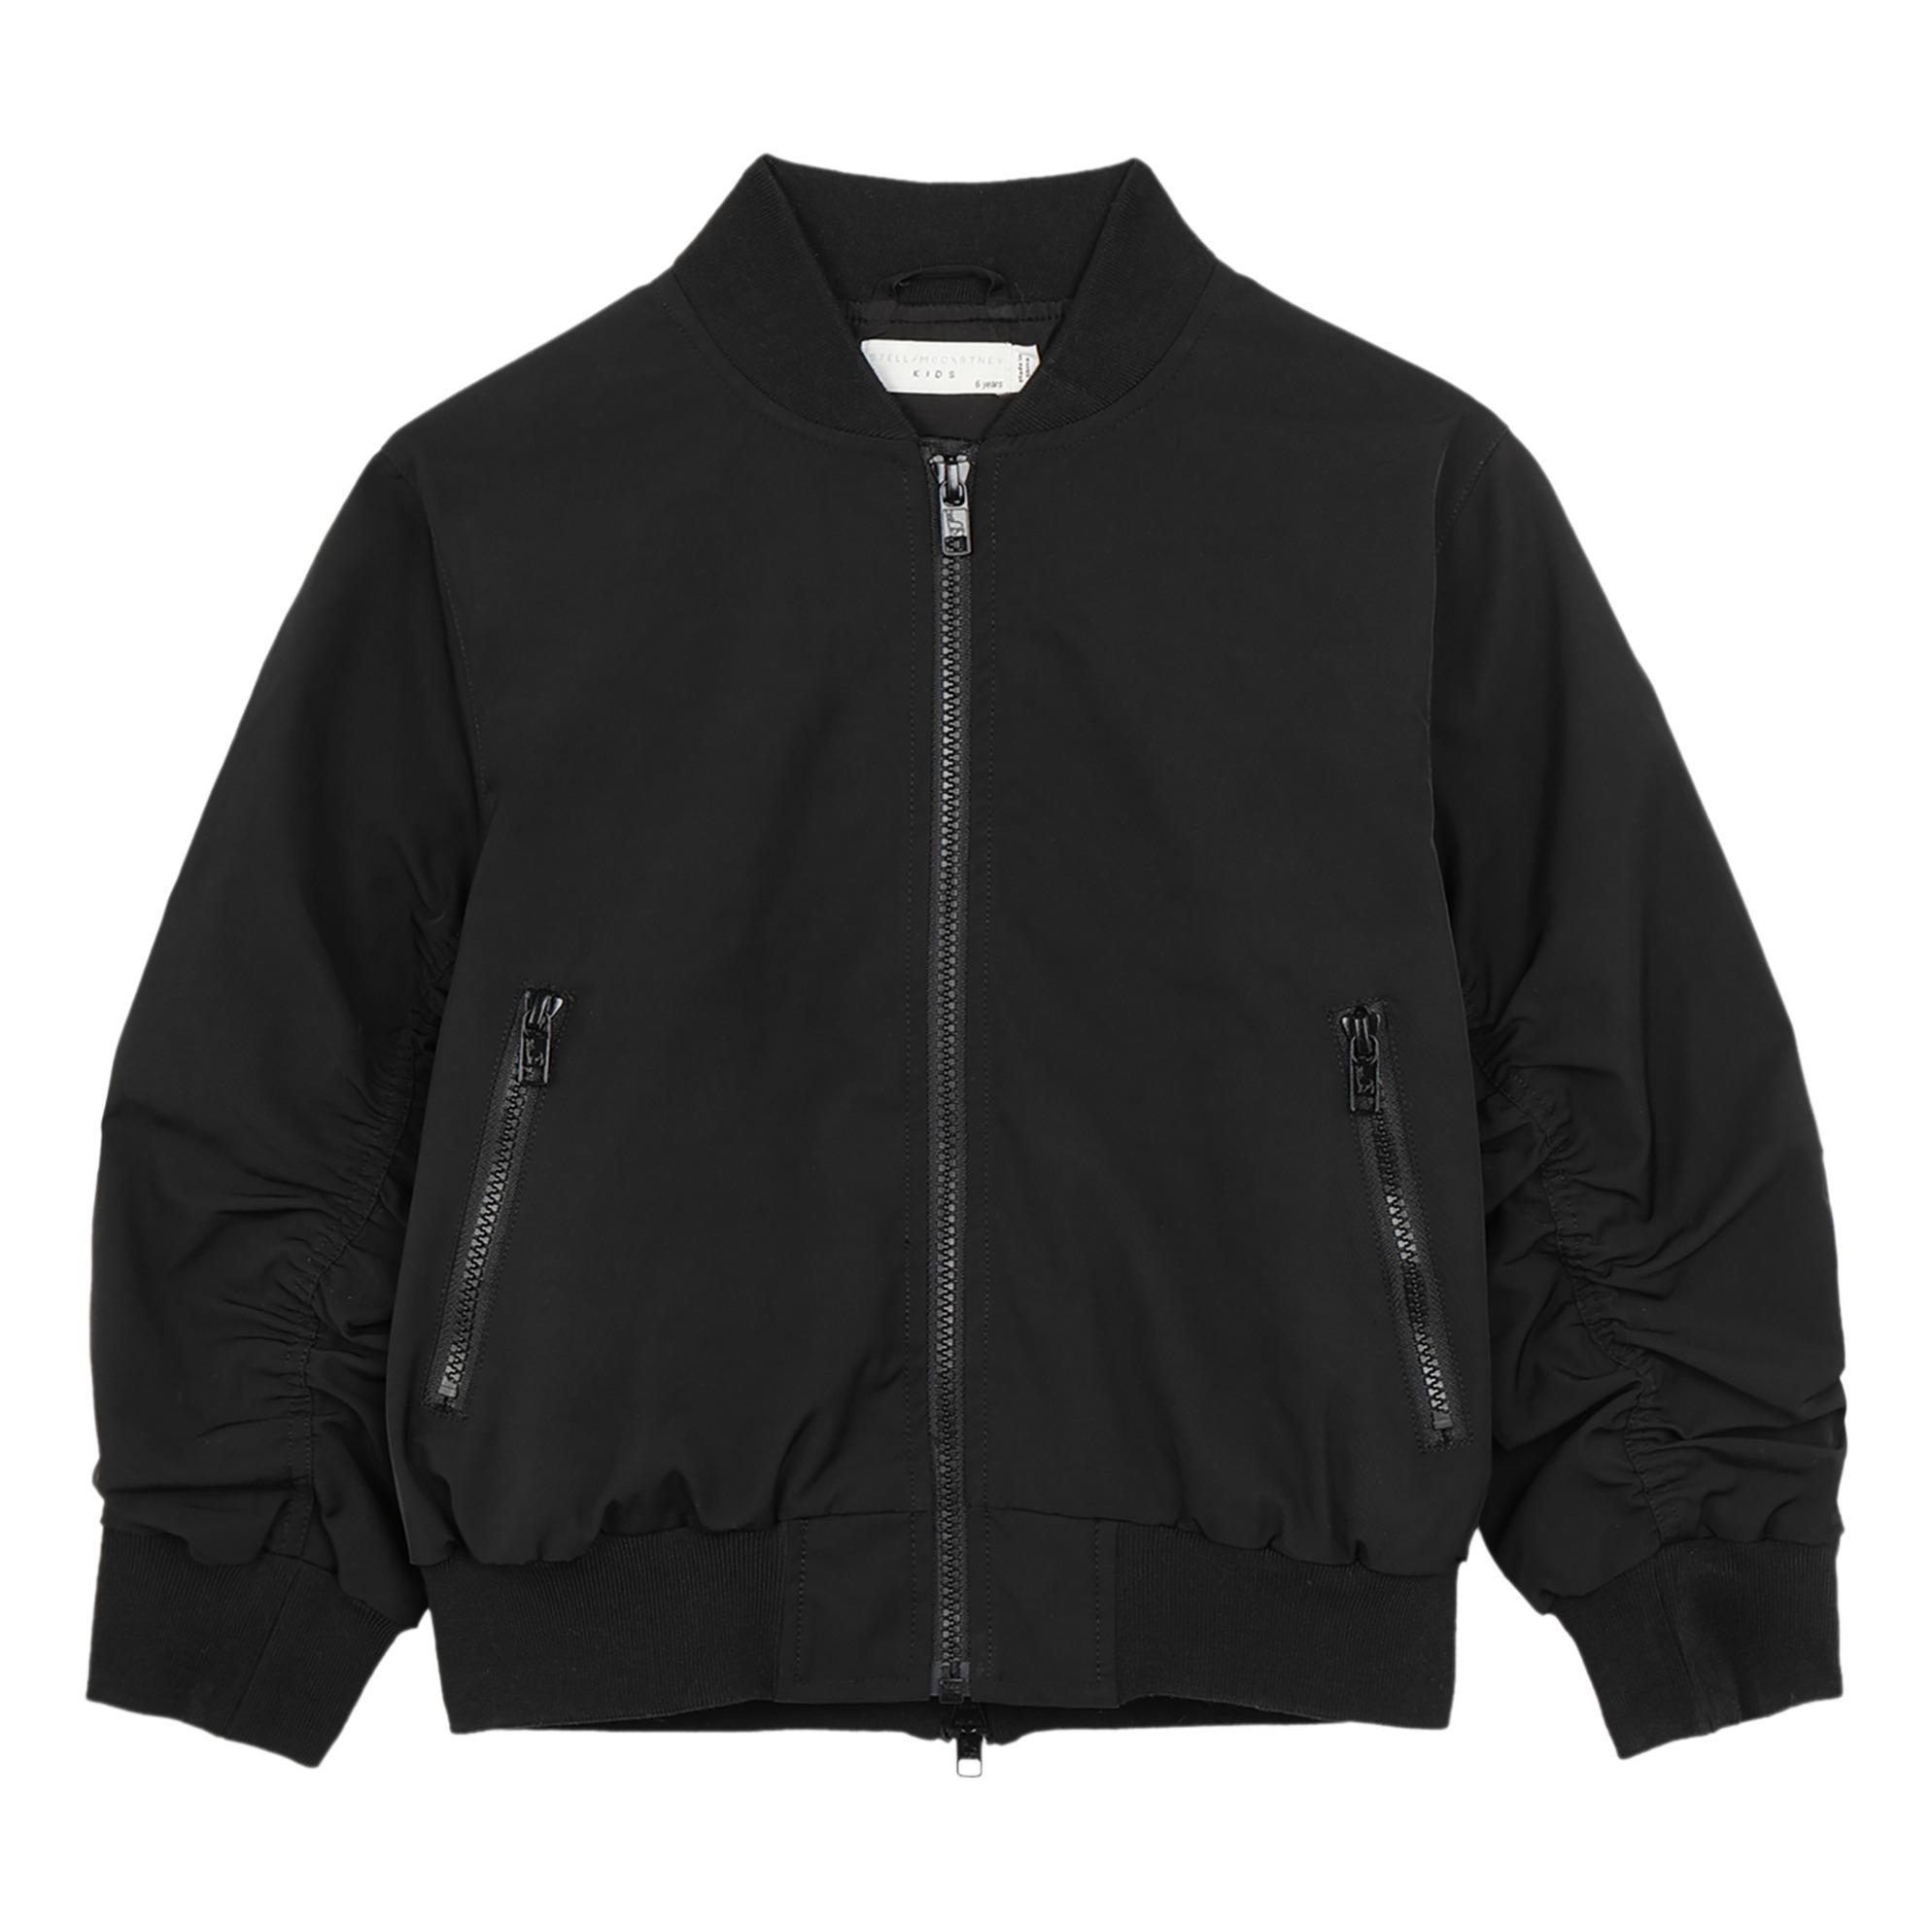 5447c6b79 Waterproof bomber jacket Black Stella McCartney Kids Fashion Teen